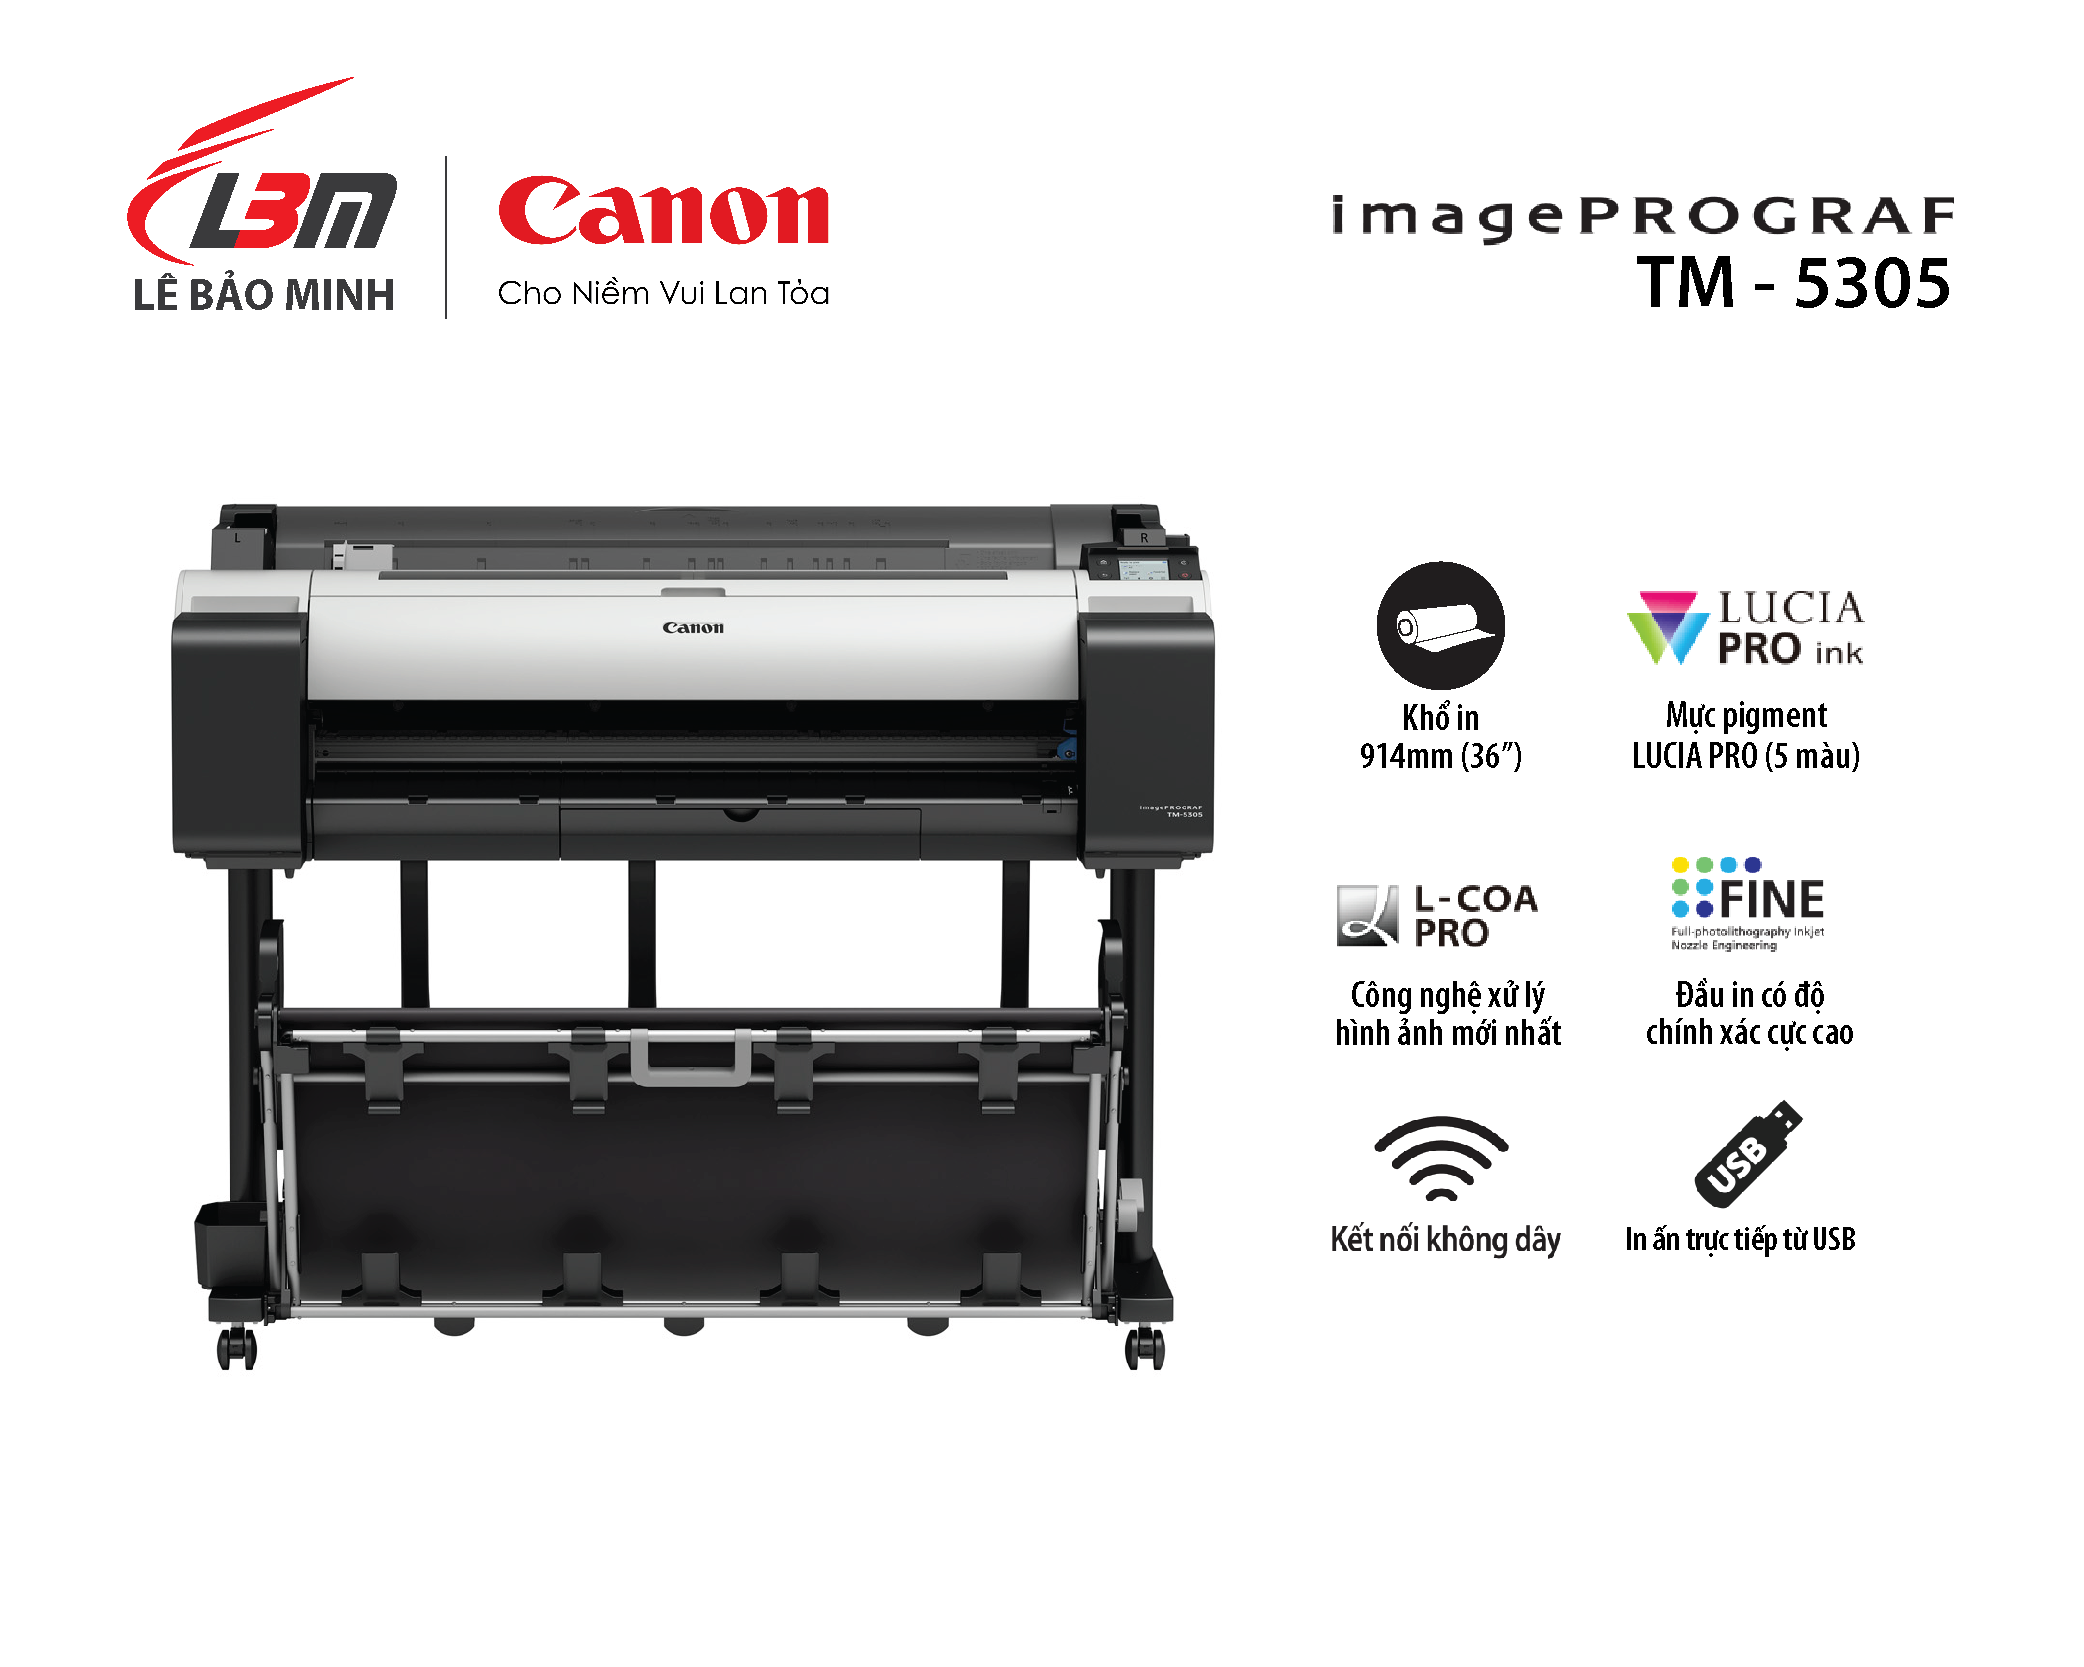 imagePROGRAF TM-5305 (5 màu mực)